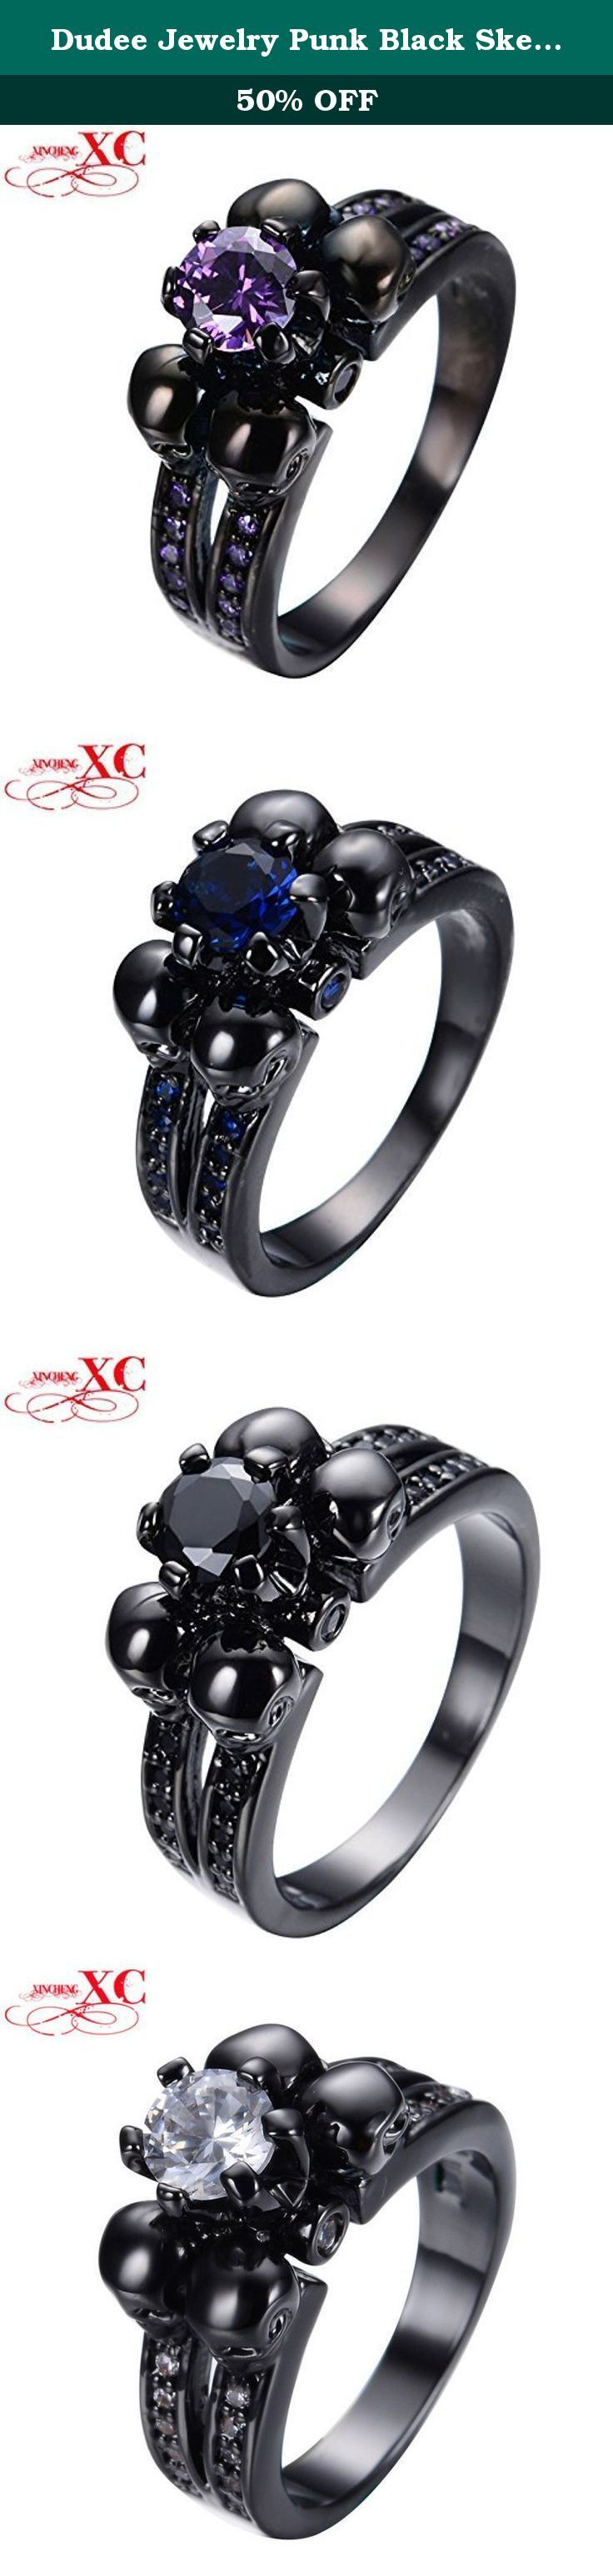 Dudee Jewelry Punk Black Skeleton Colorful Ring /Men Vintage Black Gold Filled Zircon Skull Head Halloween Ring. Dudee Jewelry Punk Black Skeleton Colorful Ring /Men Vintage Black Gold Filled Zircon Skull Head Halloween Ring.